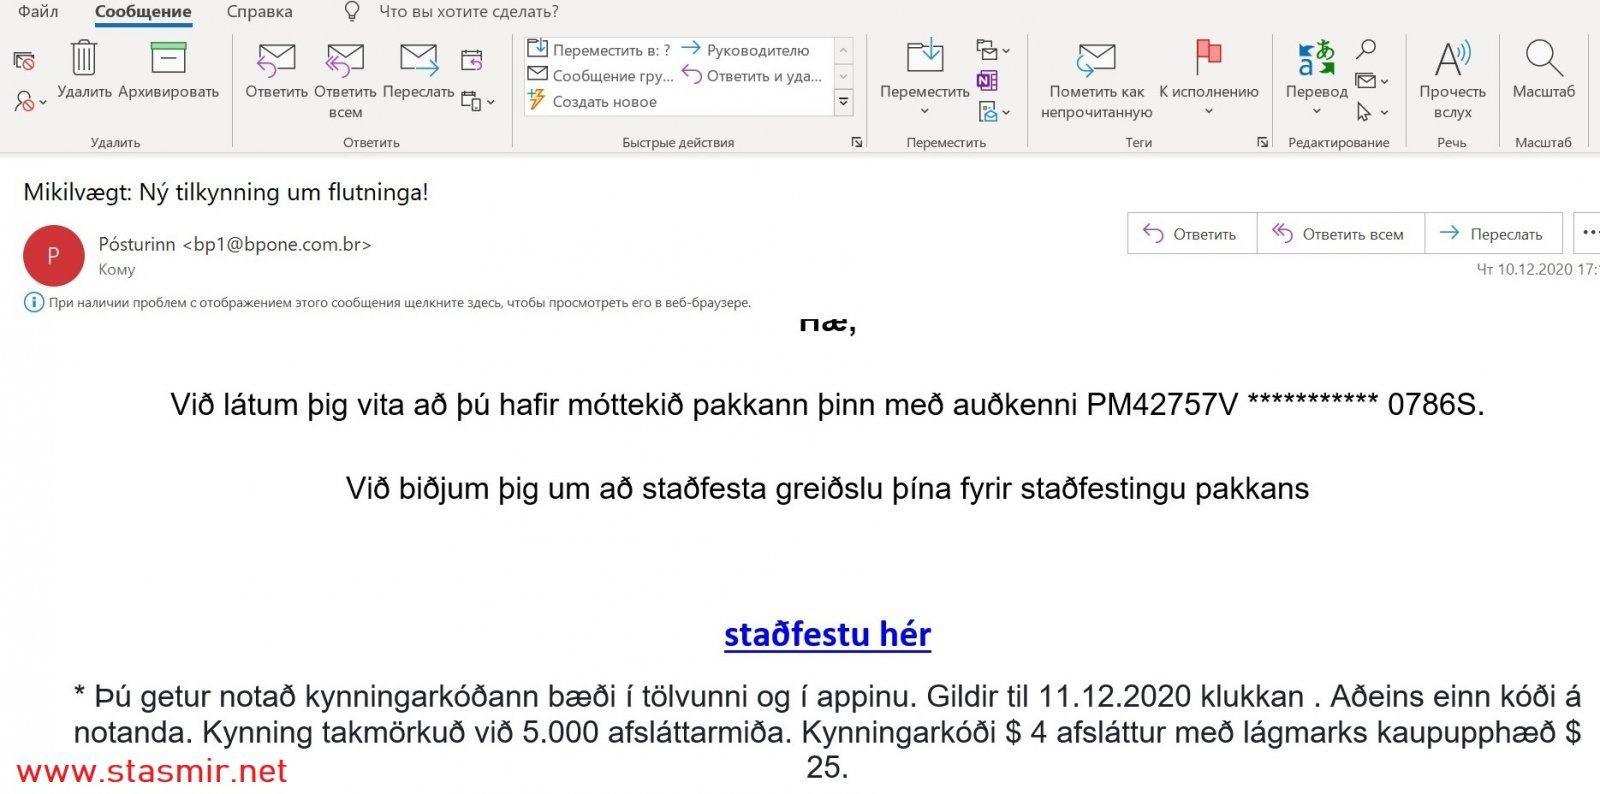 spam, фото Стасмир, photo Stasmir